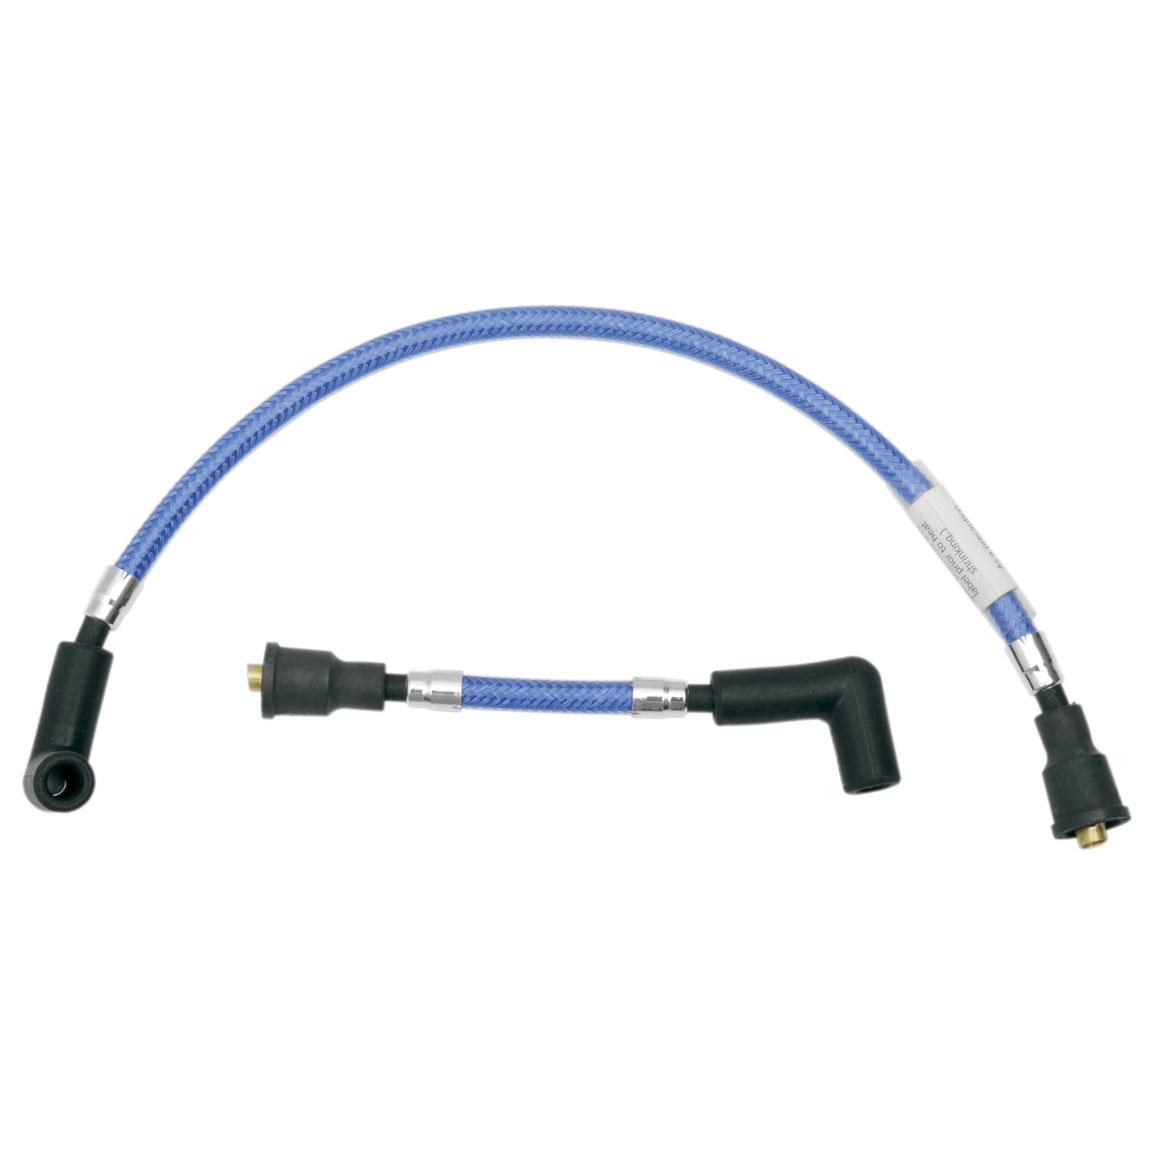 Magnum Sterling Chromite II Blue 8mm Braided Spark Plug Wire Set